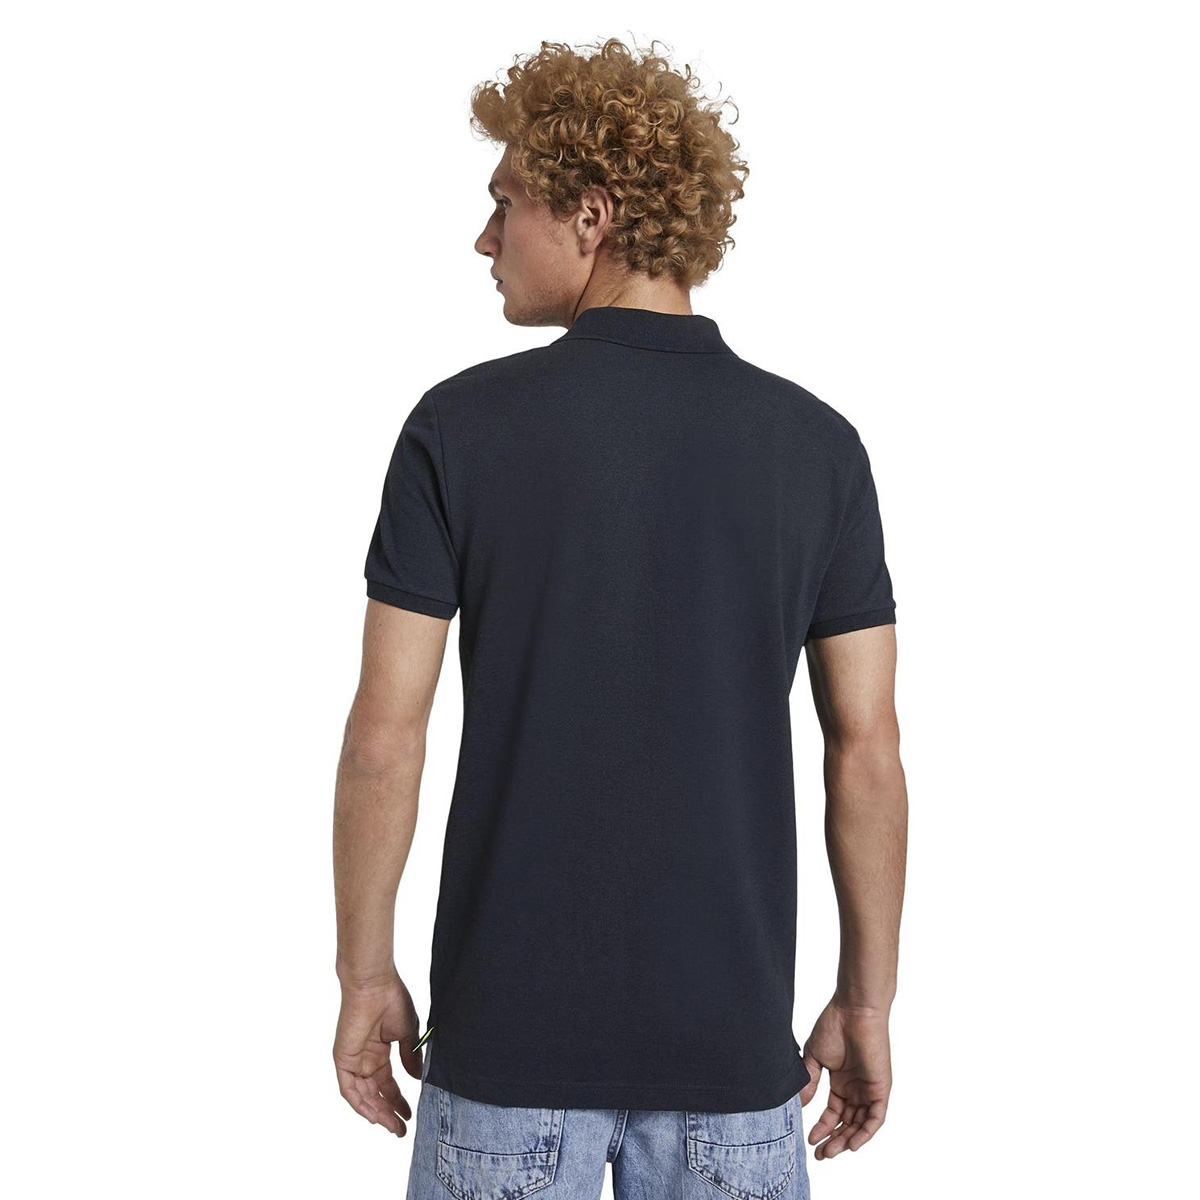 polo hemd met print 1018354xx12 tom tailor polo 13684